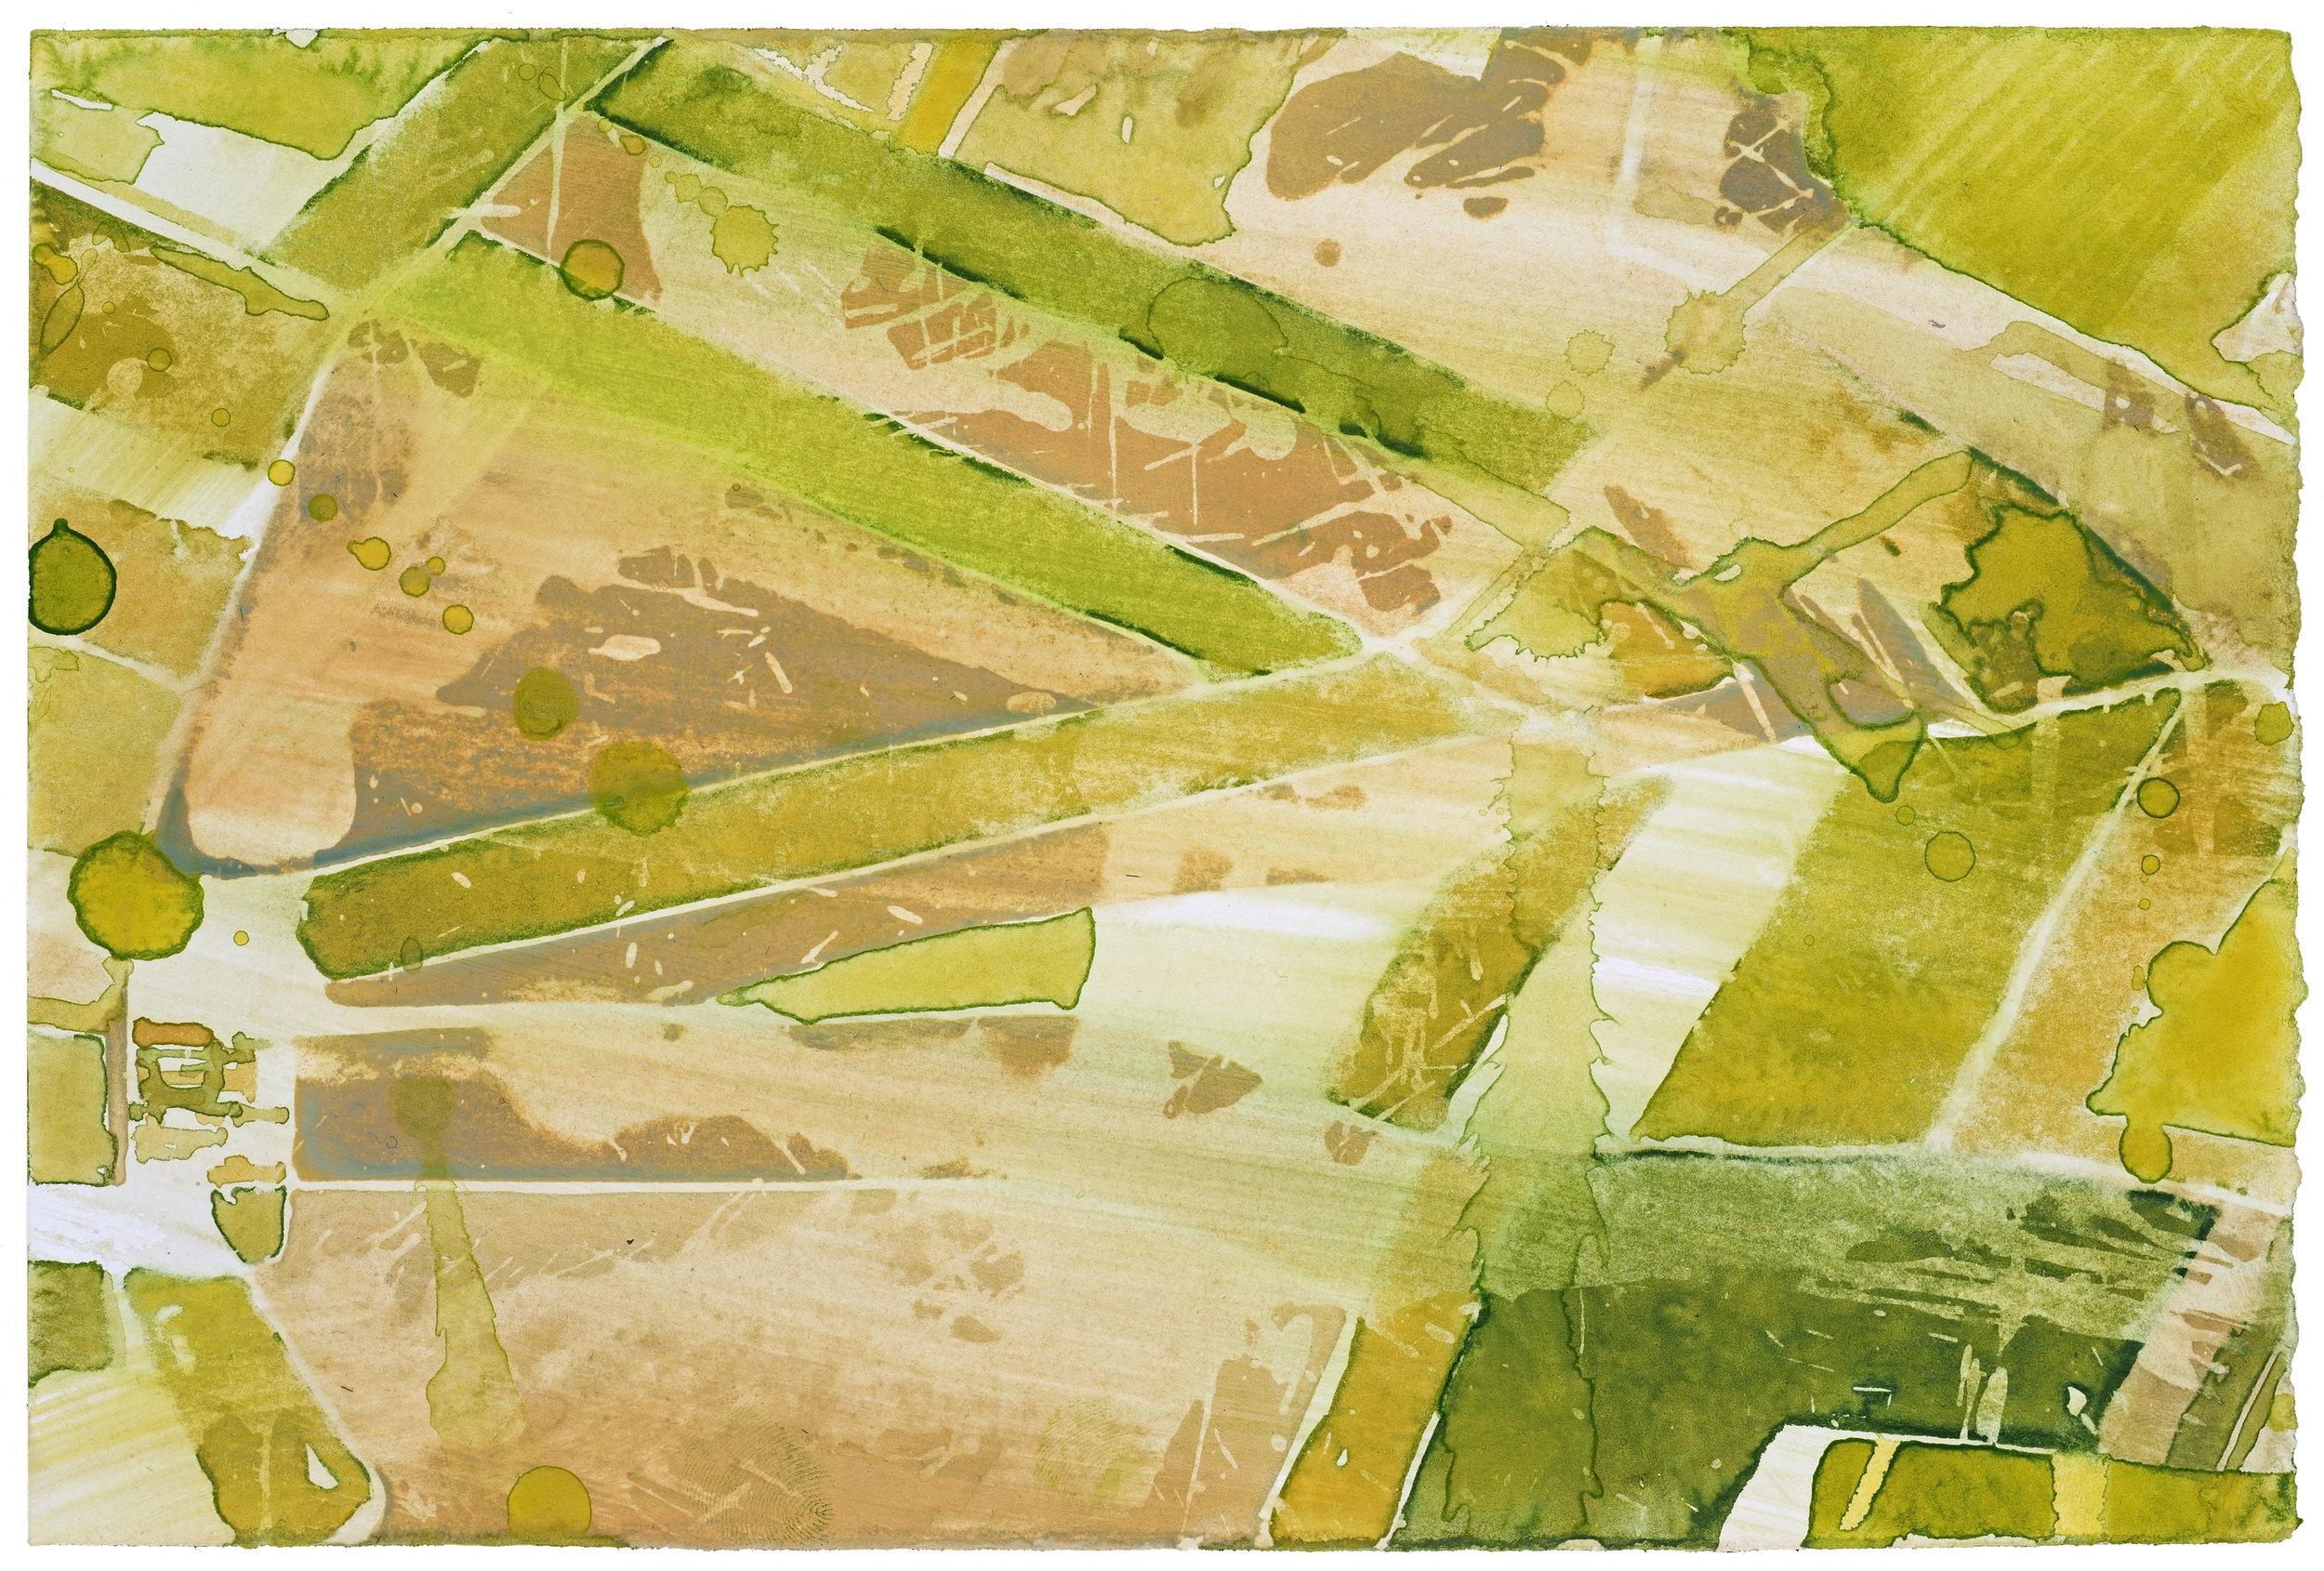 Flight AF 6207, IV,  watercolor, 15 x 25 cm, 6 x 10 in, 2015